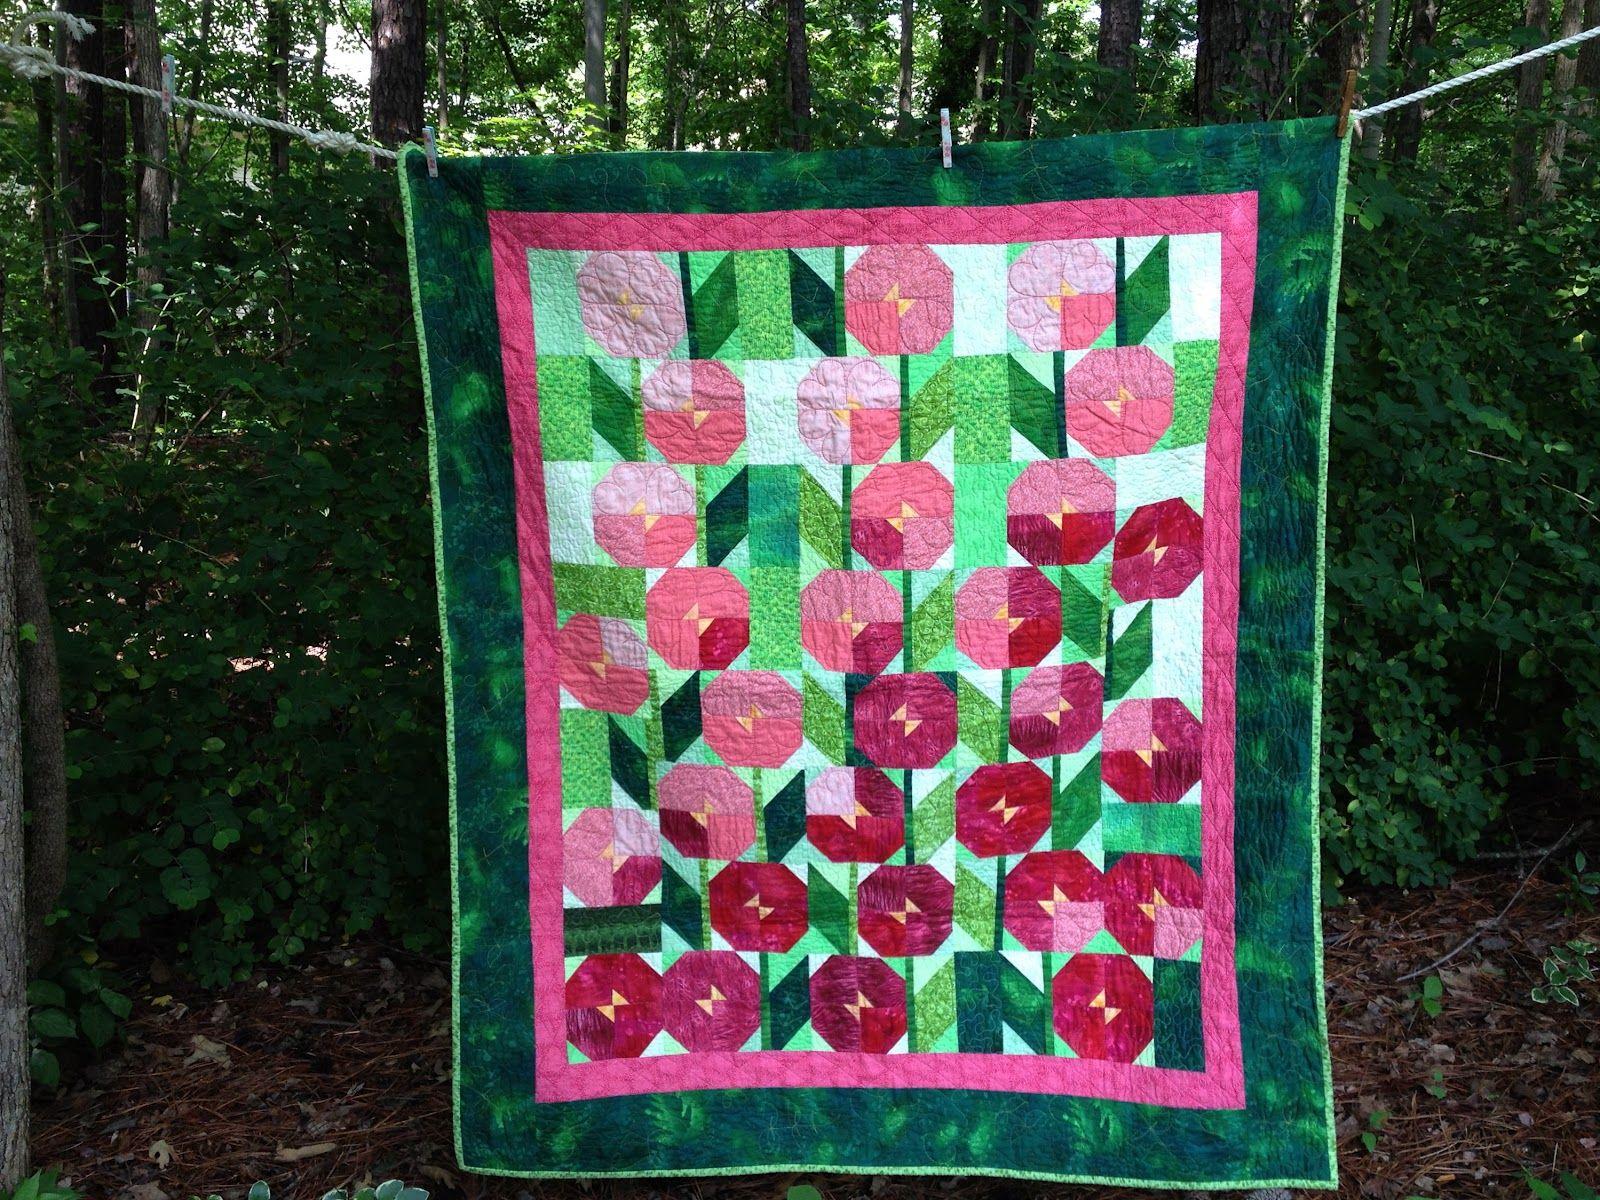 Hollyhock quilt - In Full Bloom | Plants - Flowers | Pinterest